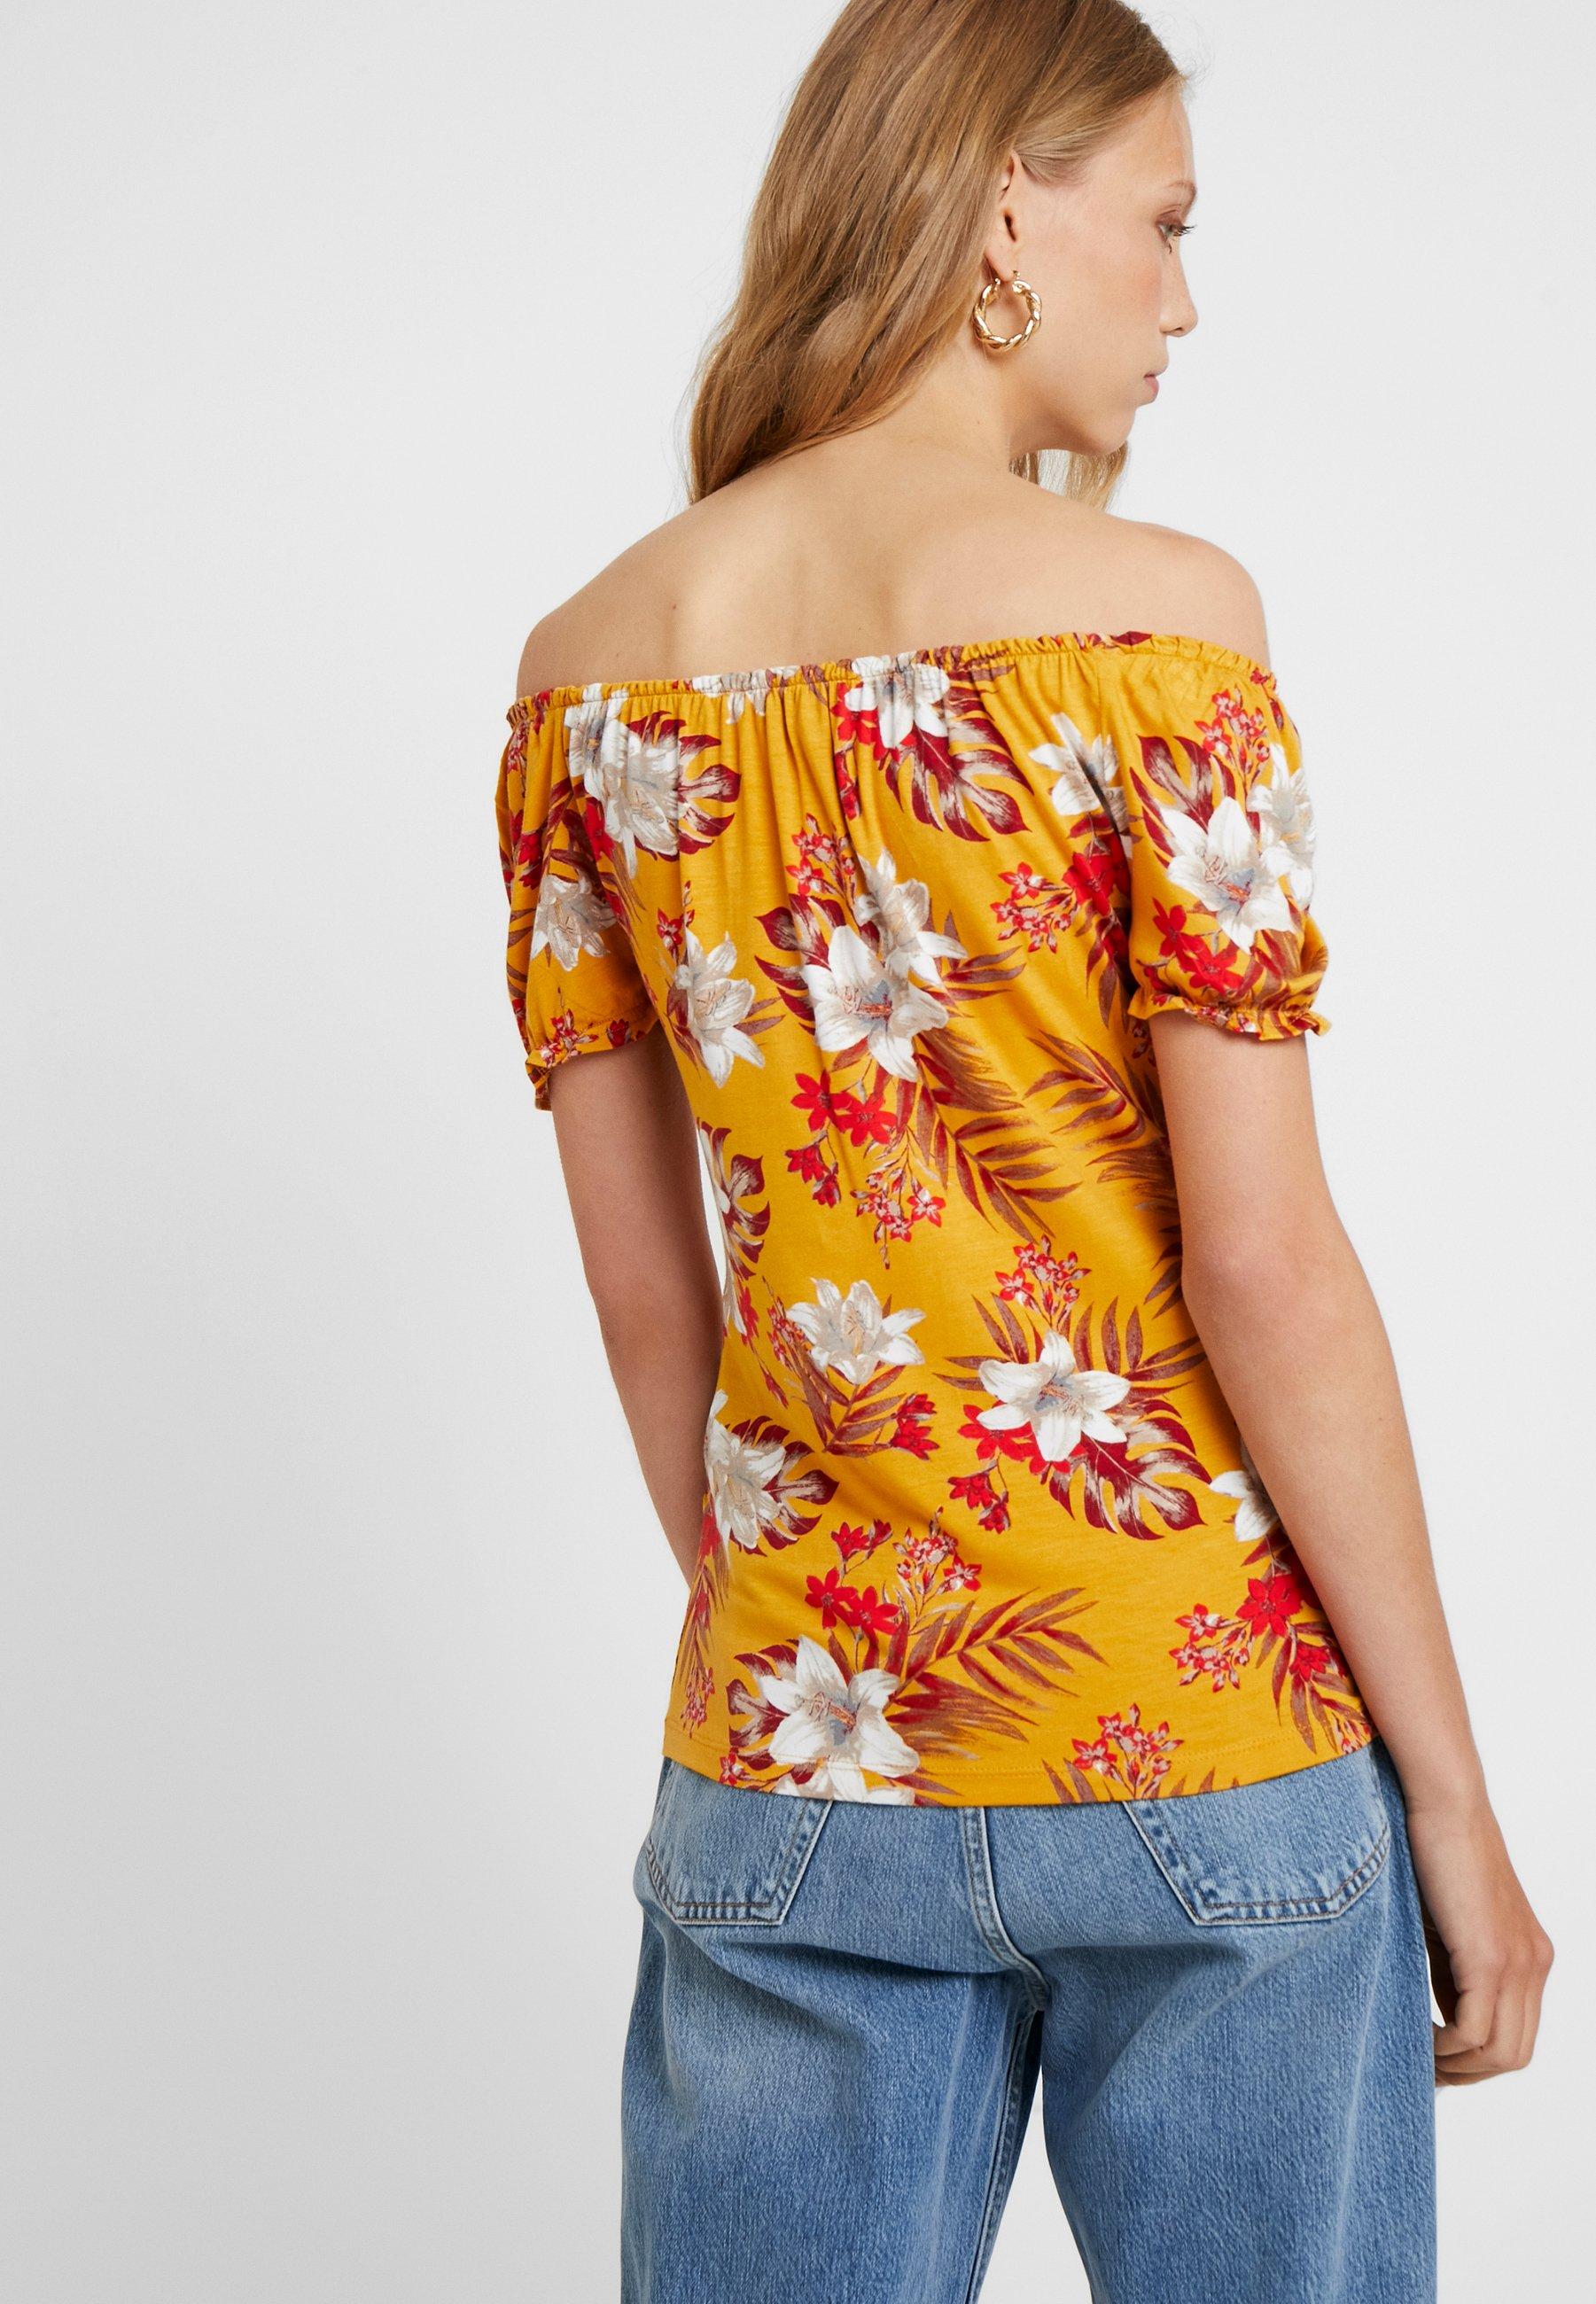 Dorothy Imprimé Button Perkins shirt Through Milkmaid TropicalT Ochre Tall Ybf7yg6